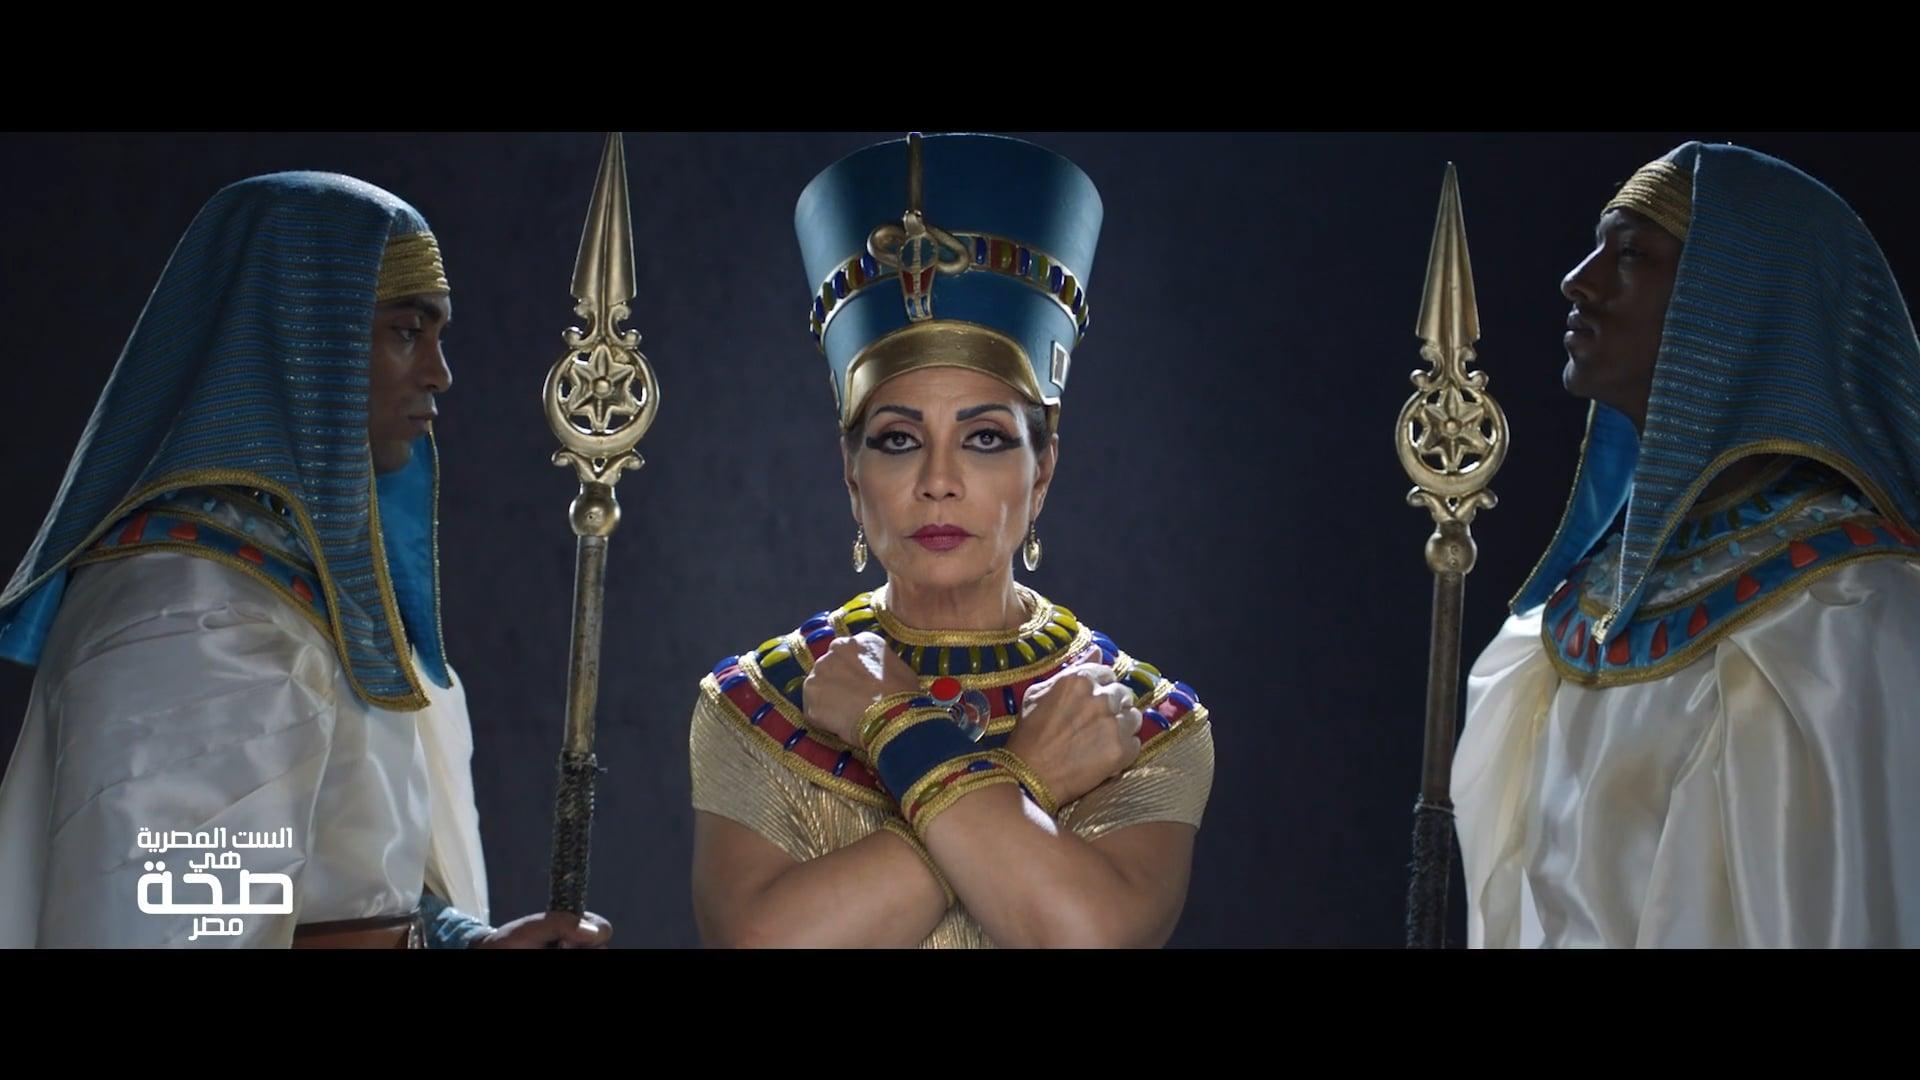 100 Million Se77a - Dir: Amr Salama, Starring Sawsan Badr